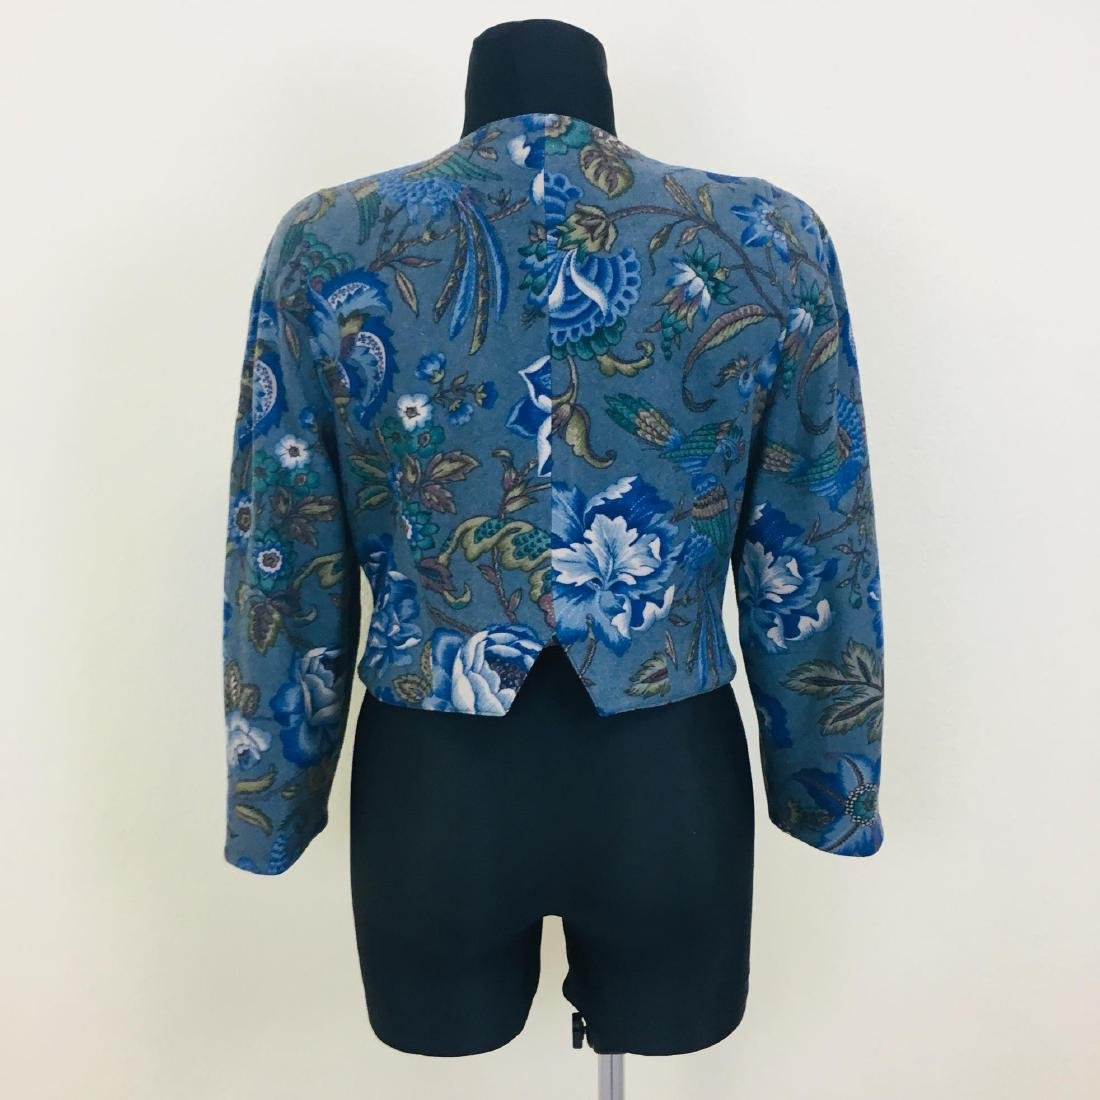 Vintage Women's Wool Blend Blazer Jacket - 6